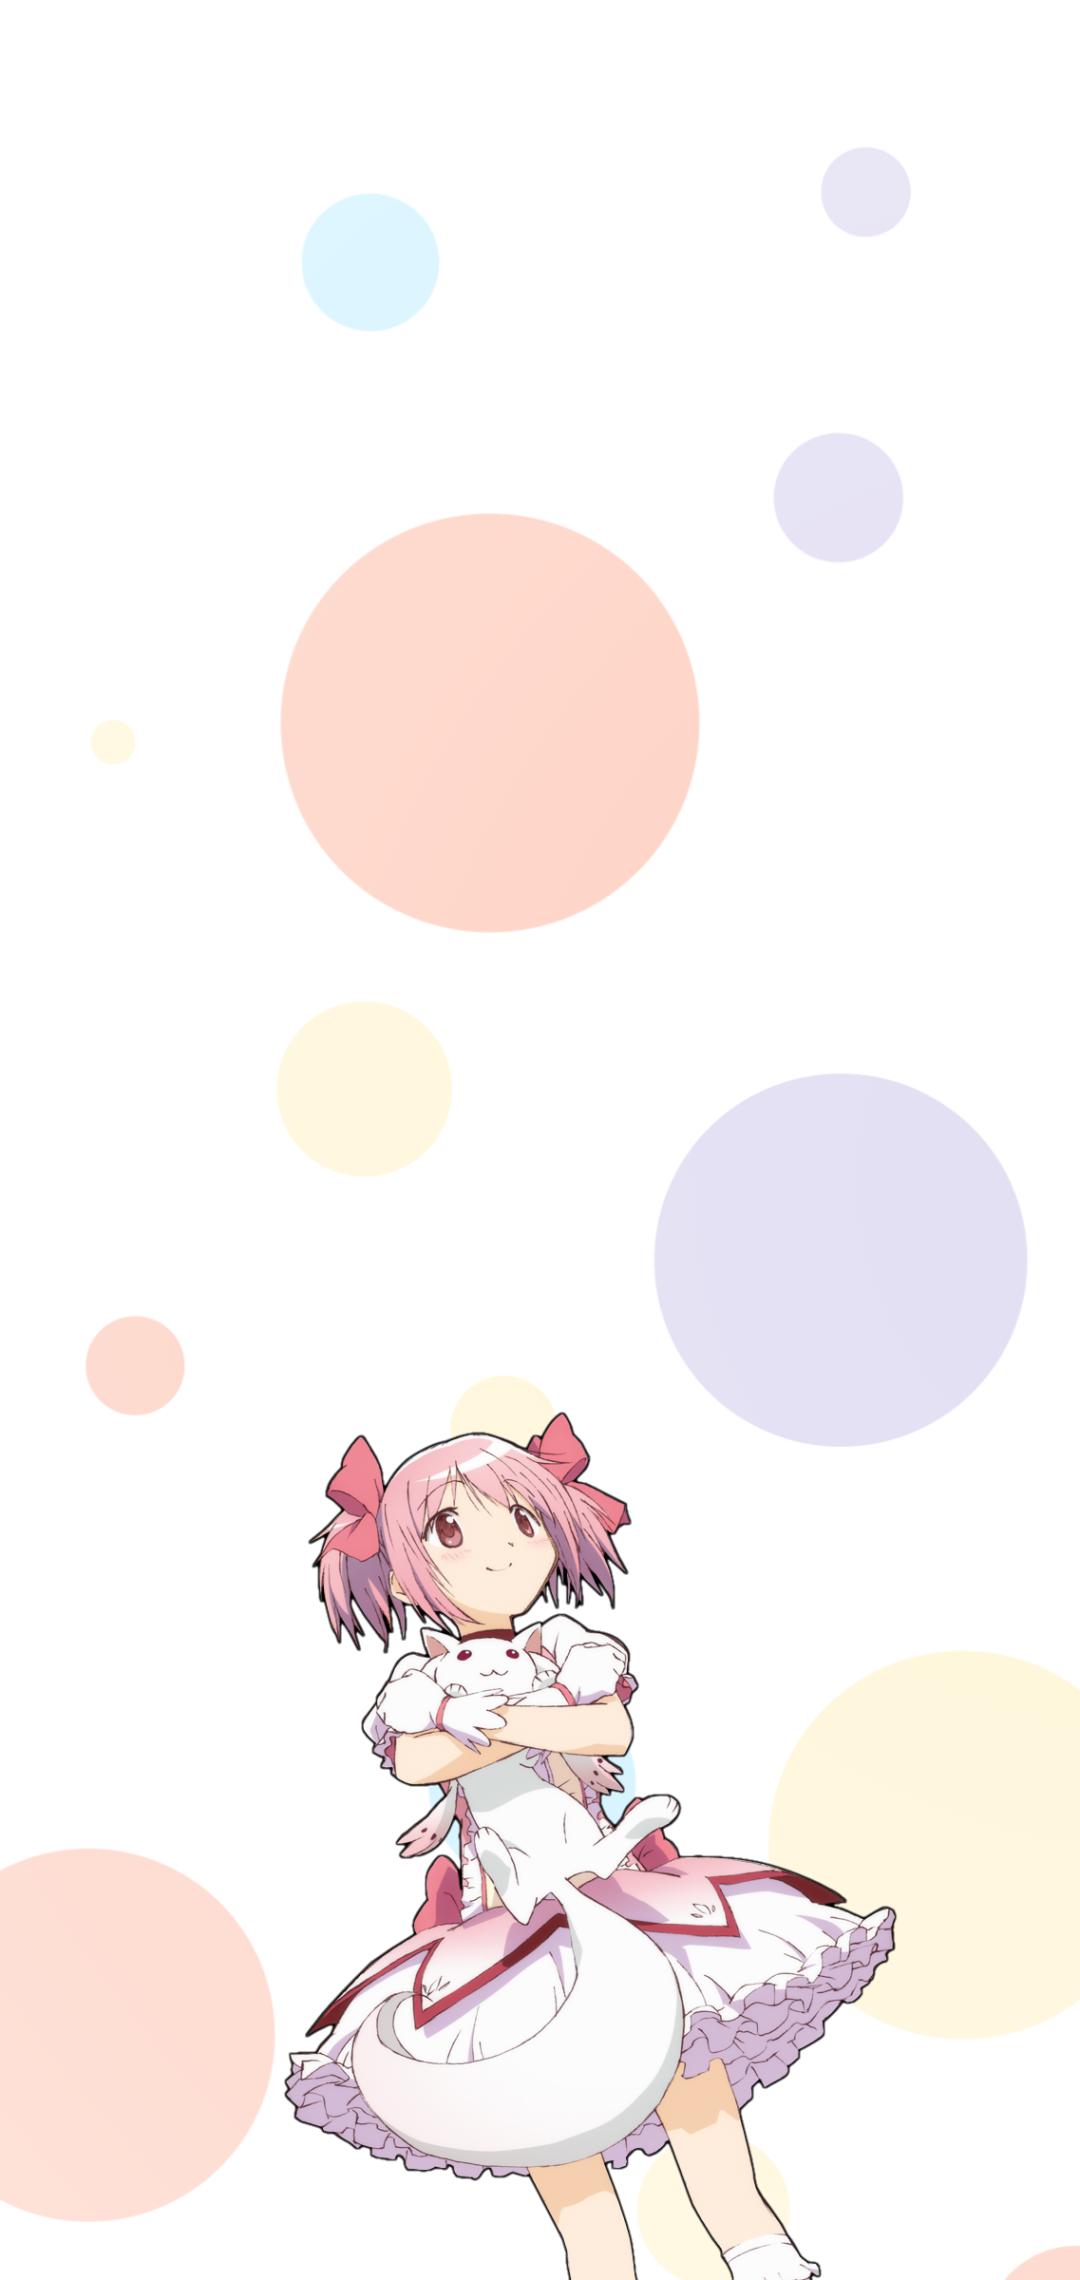 Wallpaper 846689